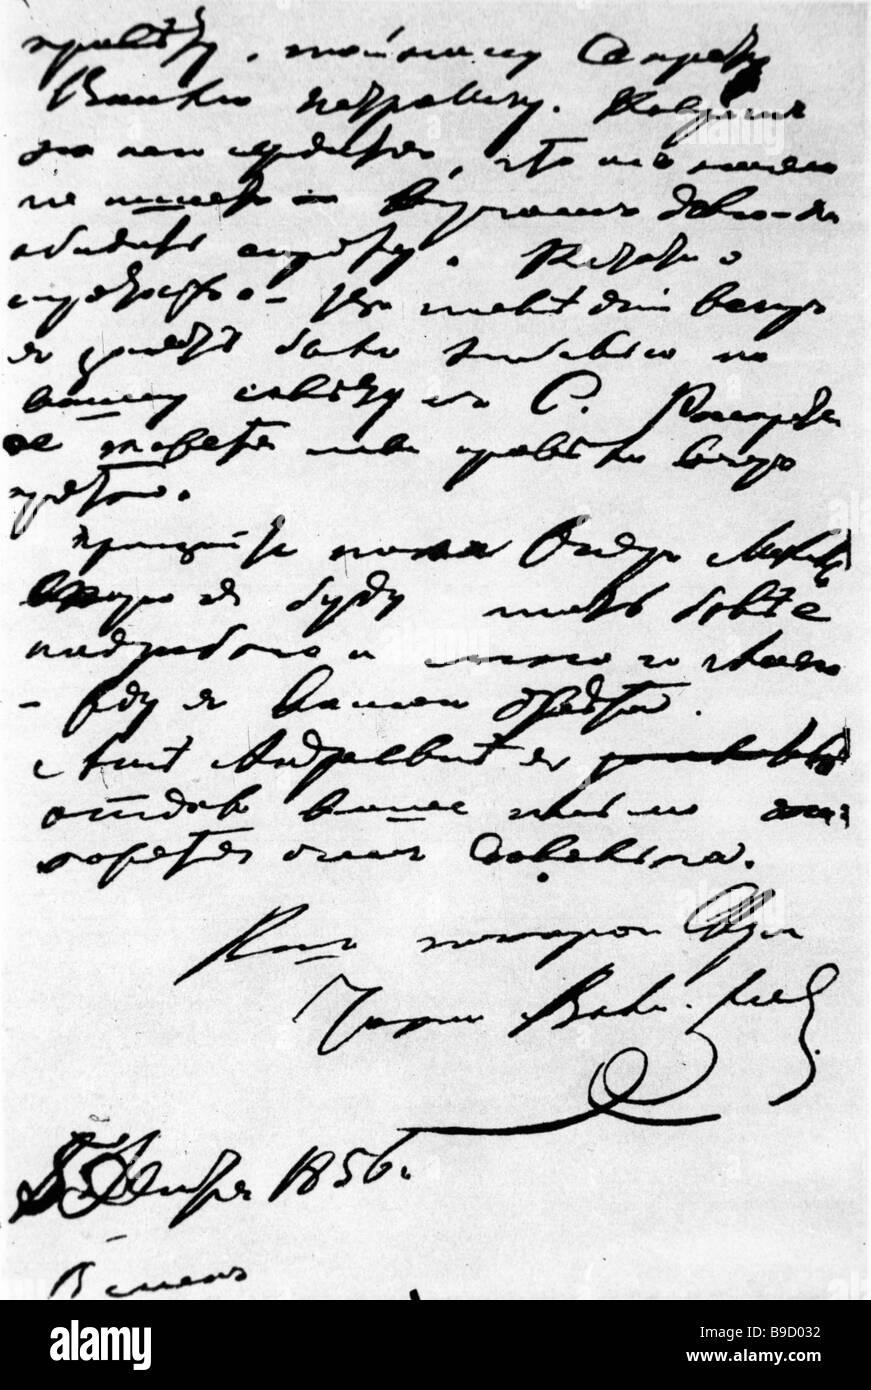 Autograph of Chokan Valikhanov s December 5 1856 letter to Feodor Dostoyevsky - Stock Image